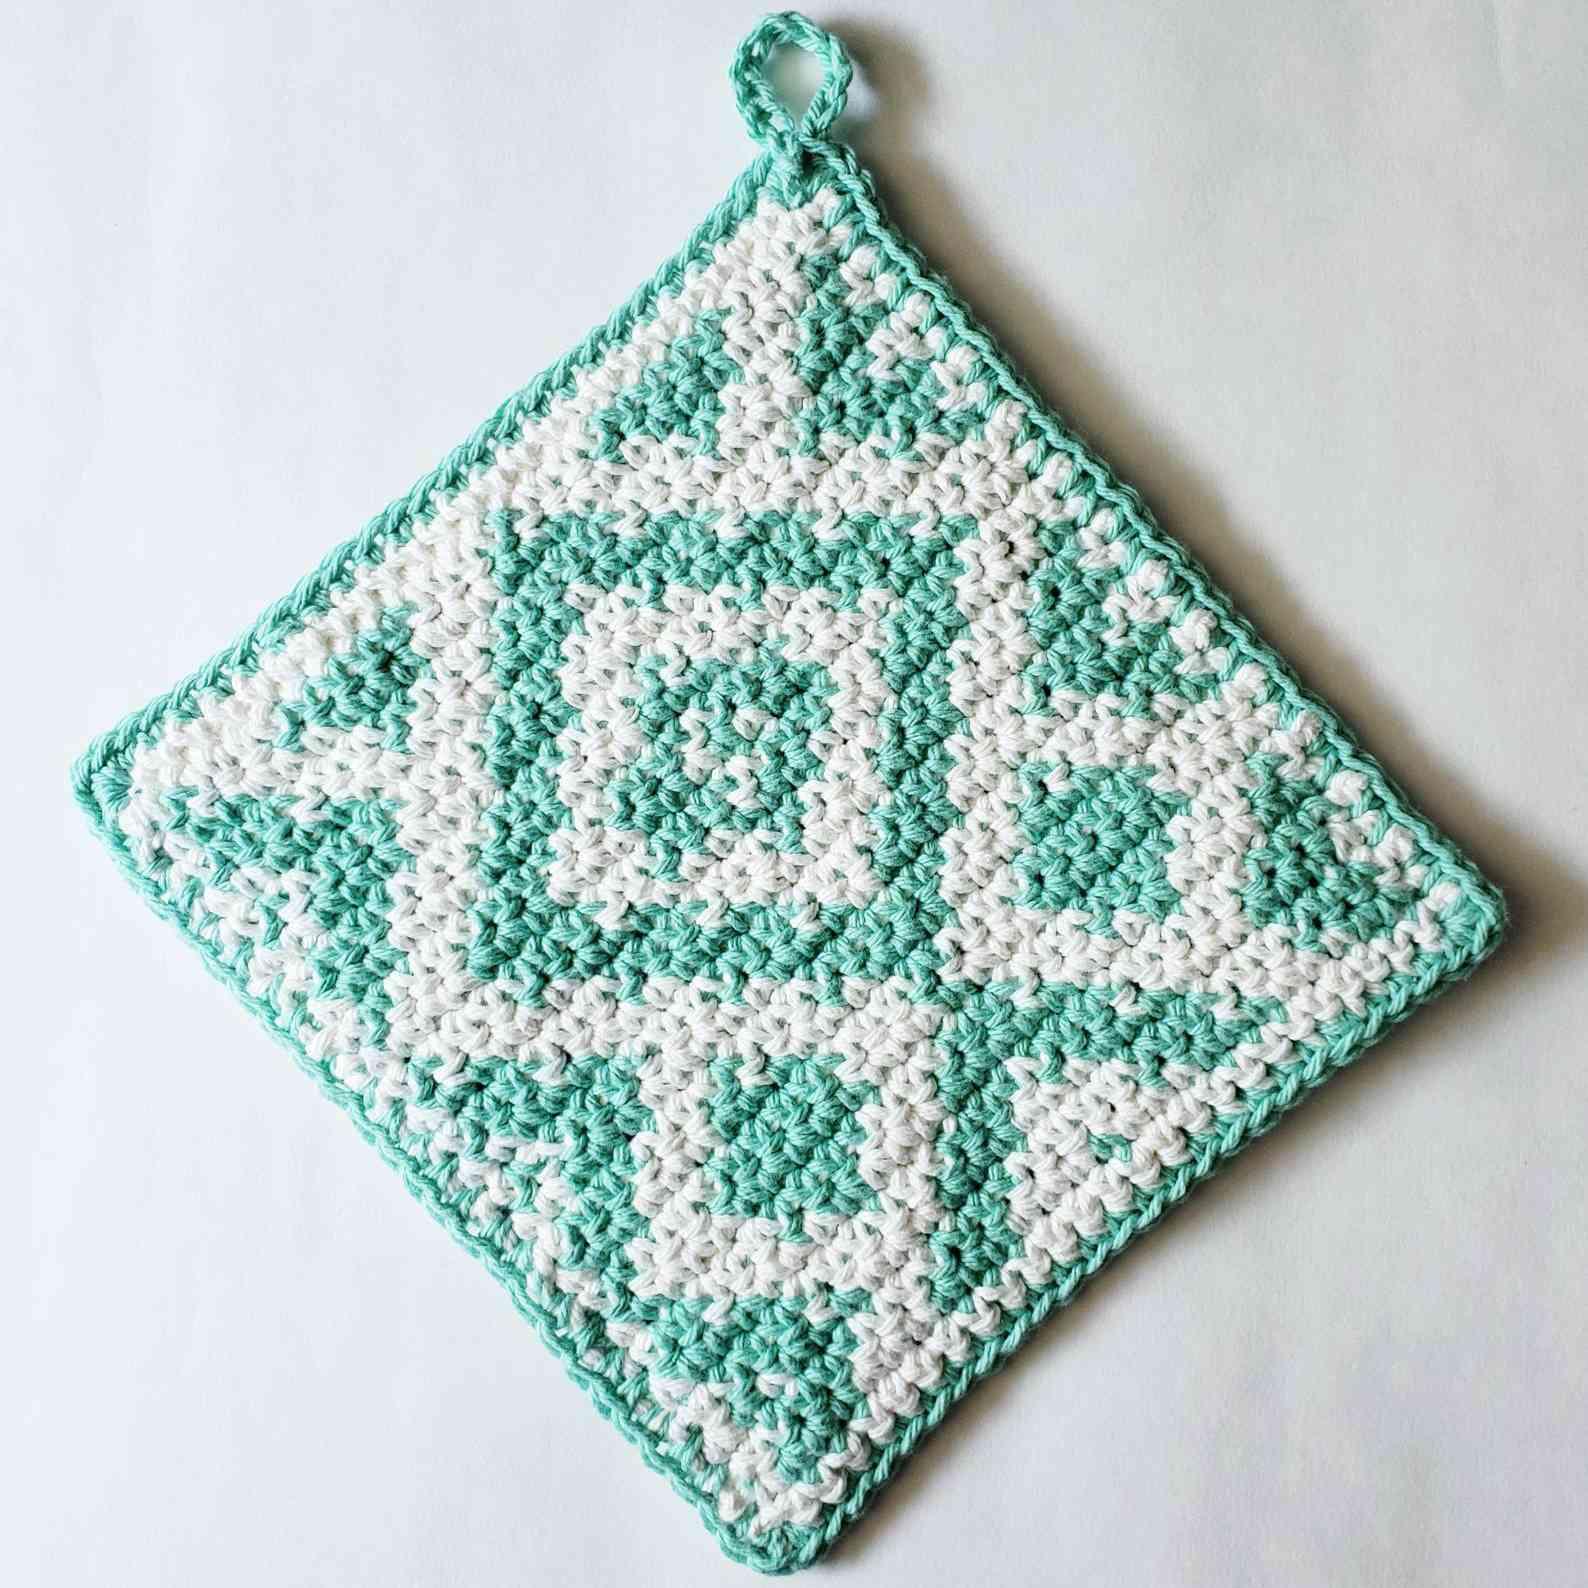 Tapestry Crochet Diamond Pot Holder Pattern